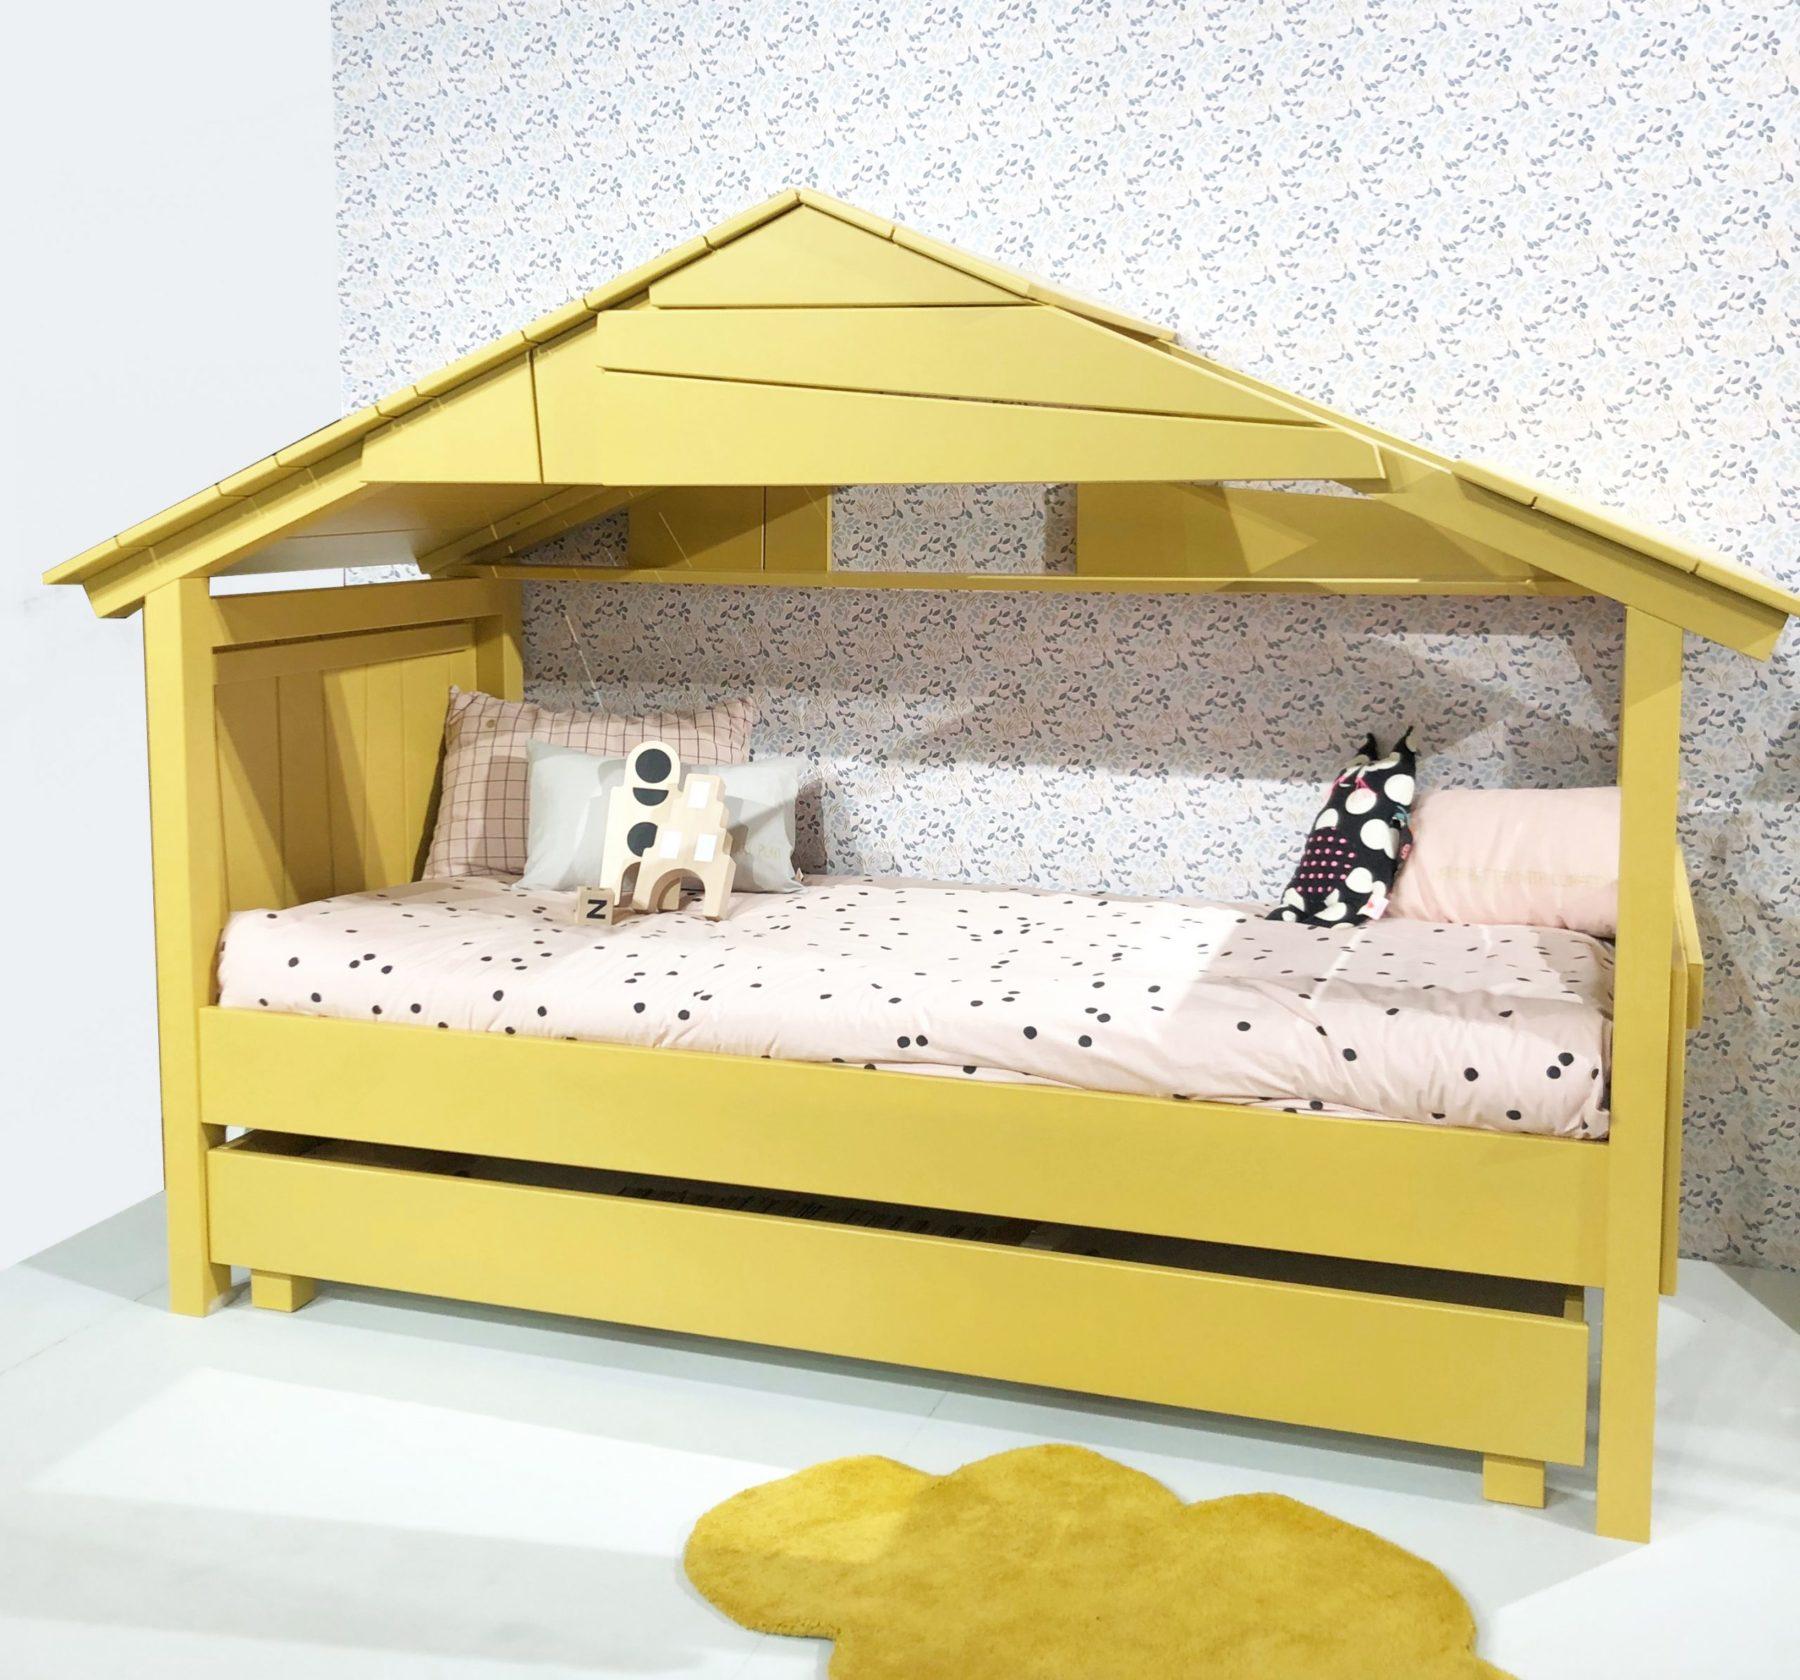 Hotel Furniture for Children